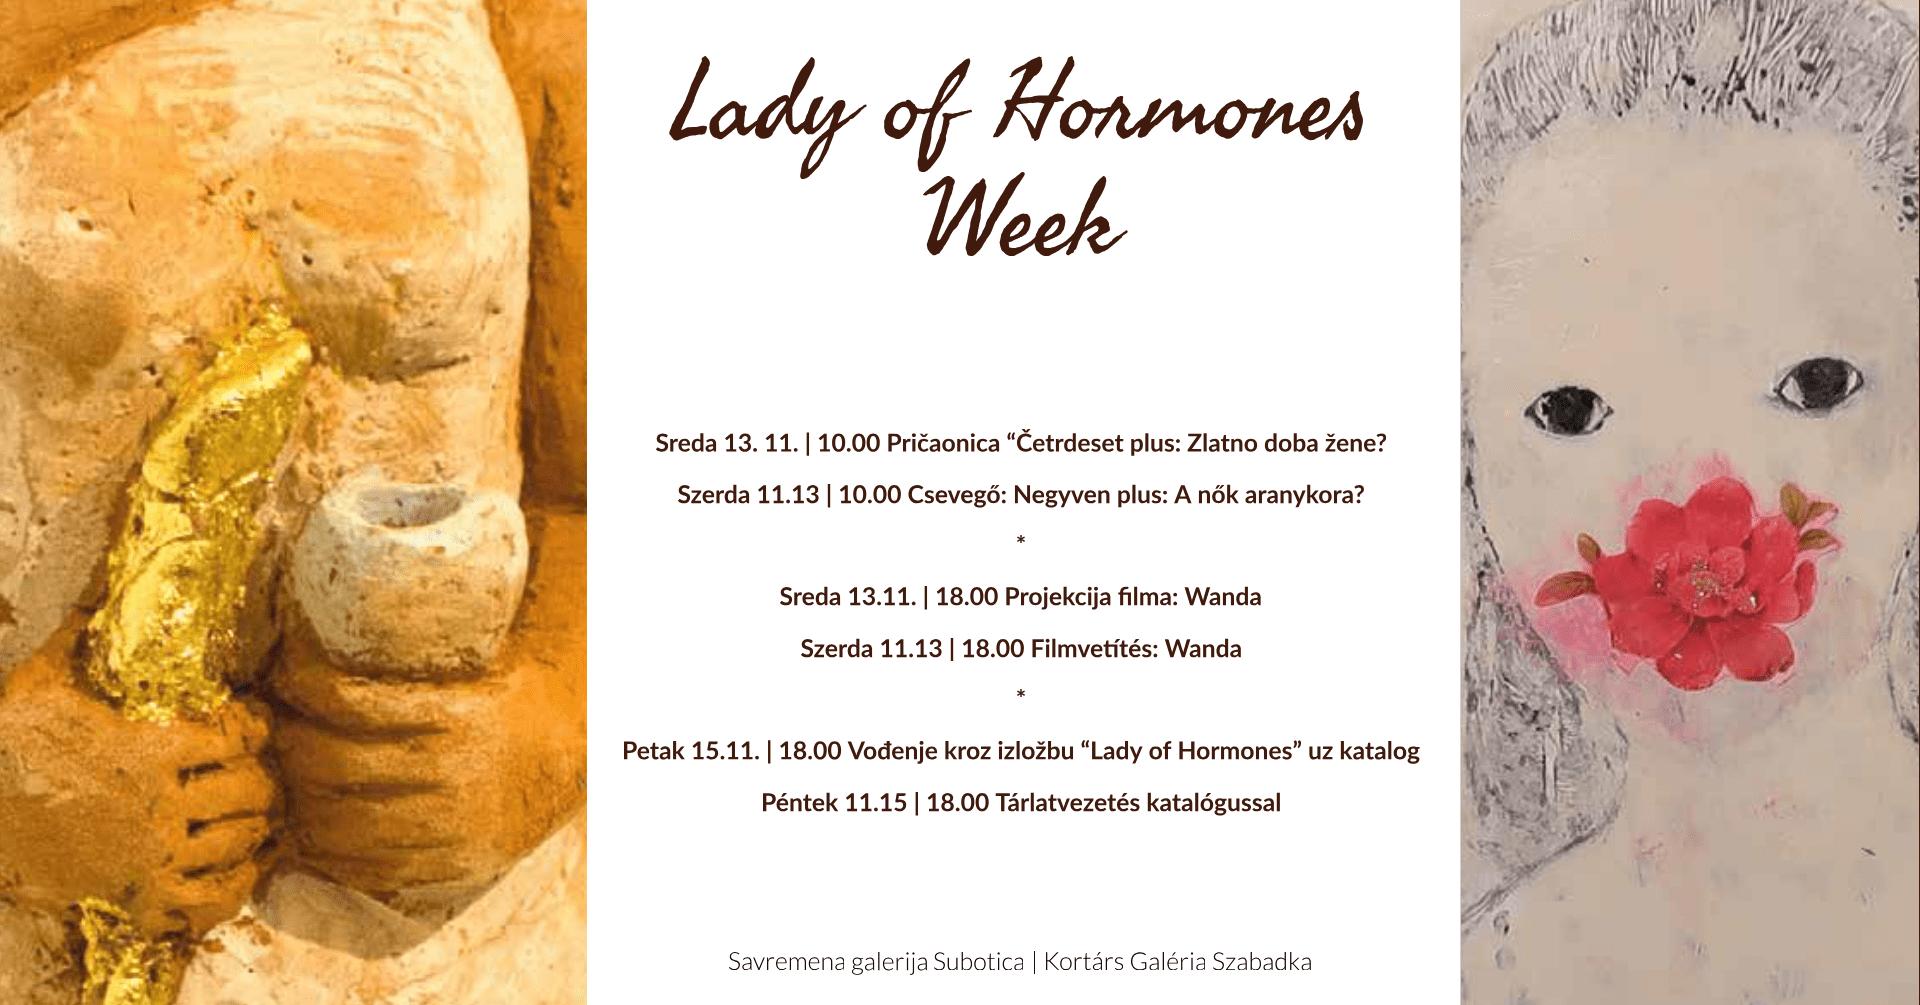 LADY OF HORMONES WEEK U SAVREMENOJ GALERIJI SUBOTICA